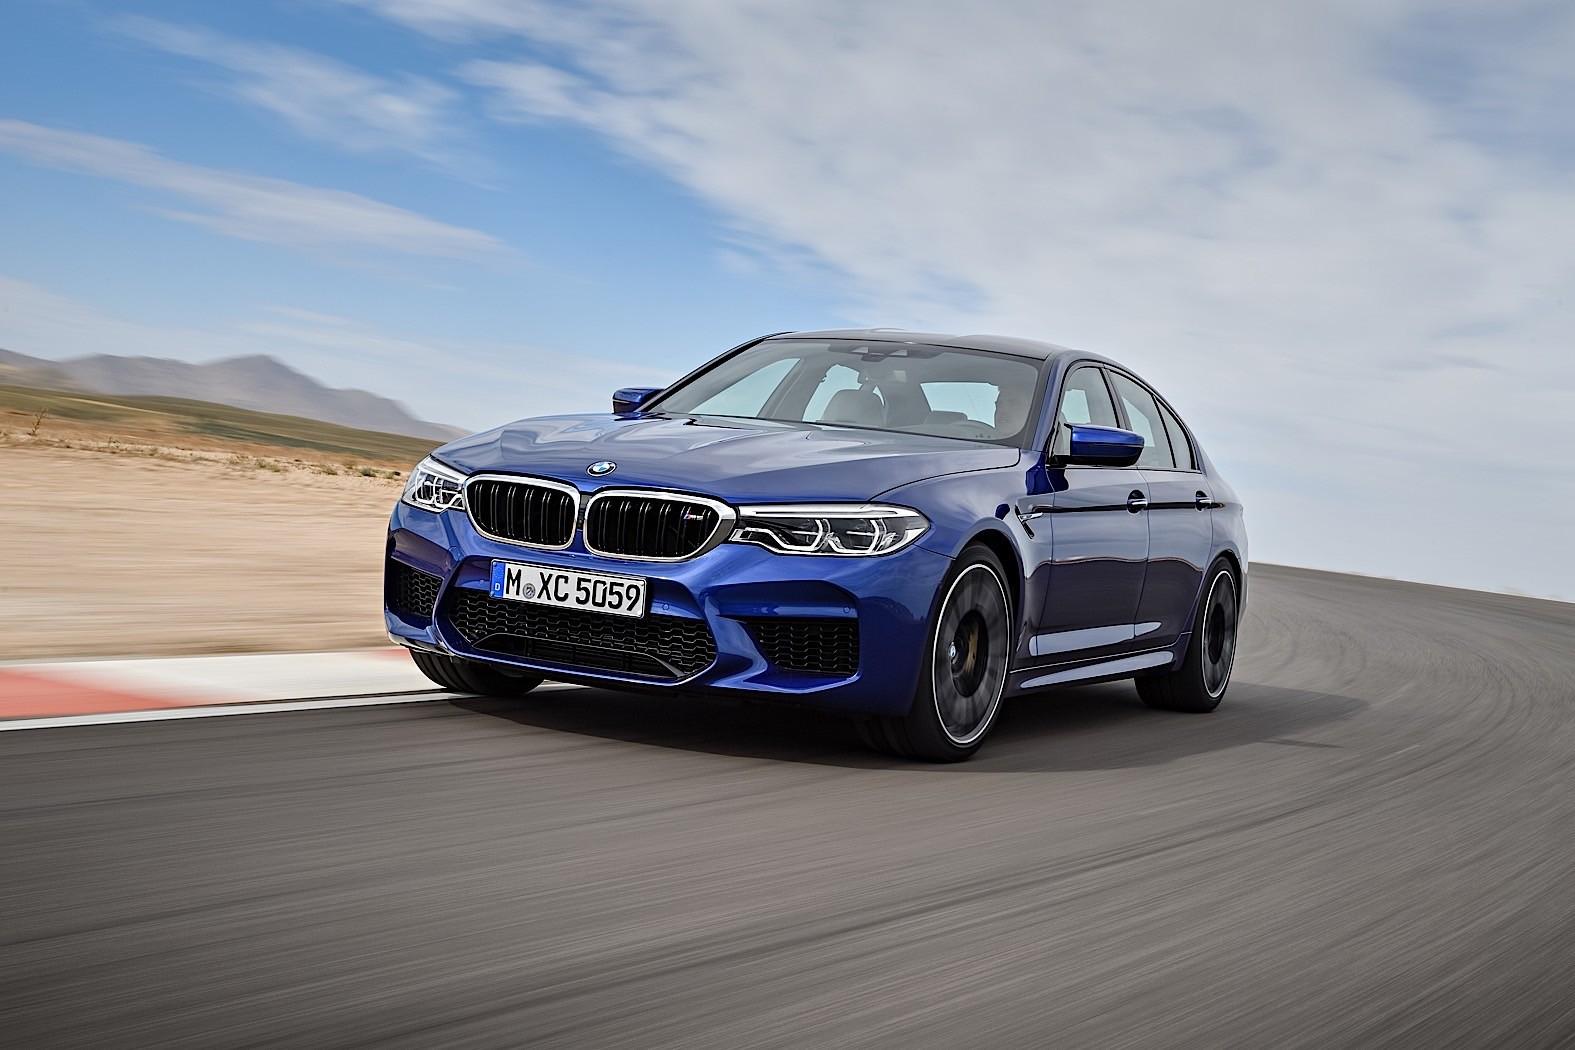 2018 BMW M5 High-Speed Drifting Is Timo Glock's Smoke Show